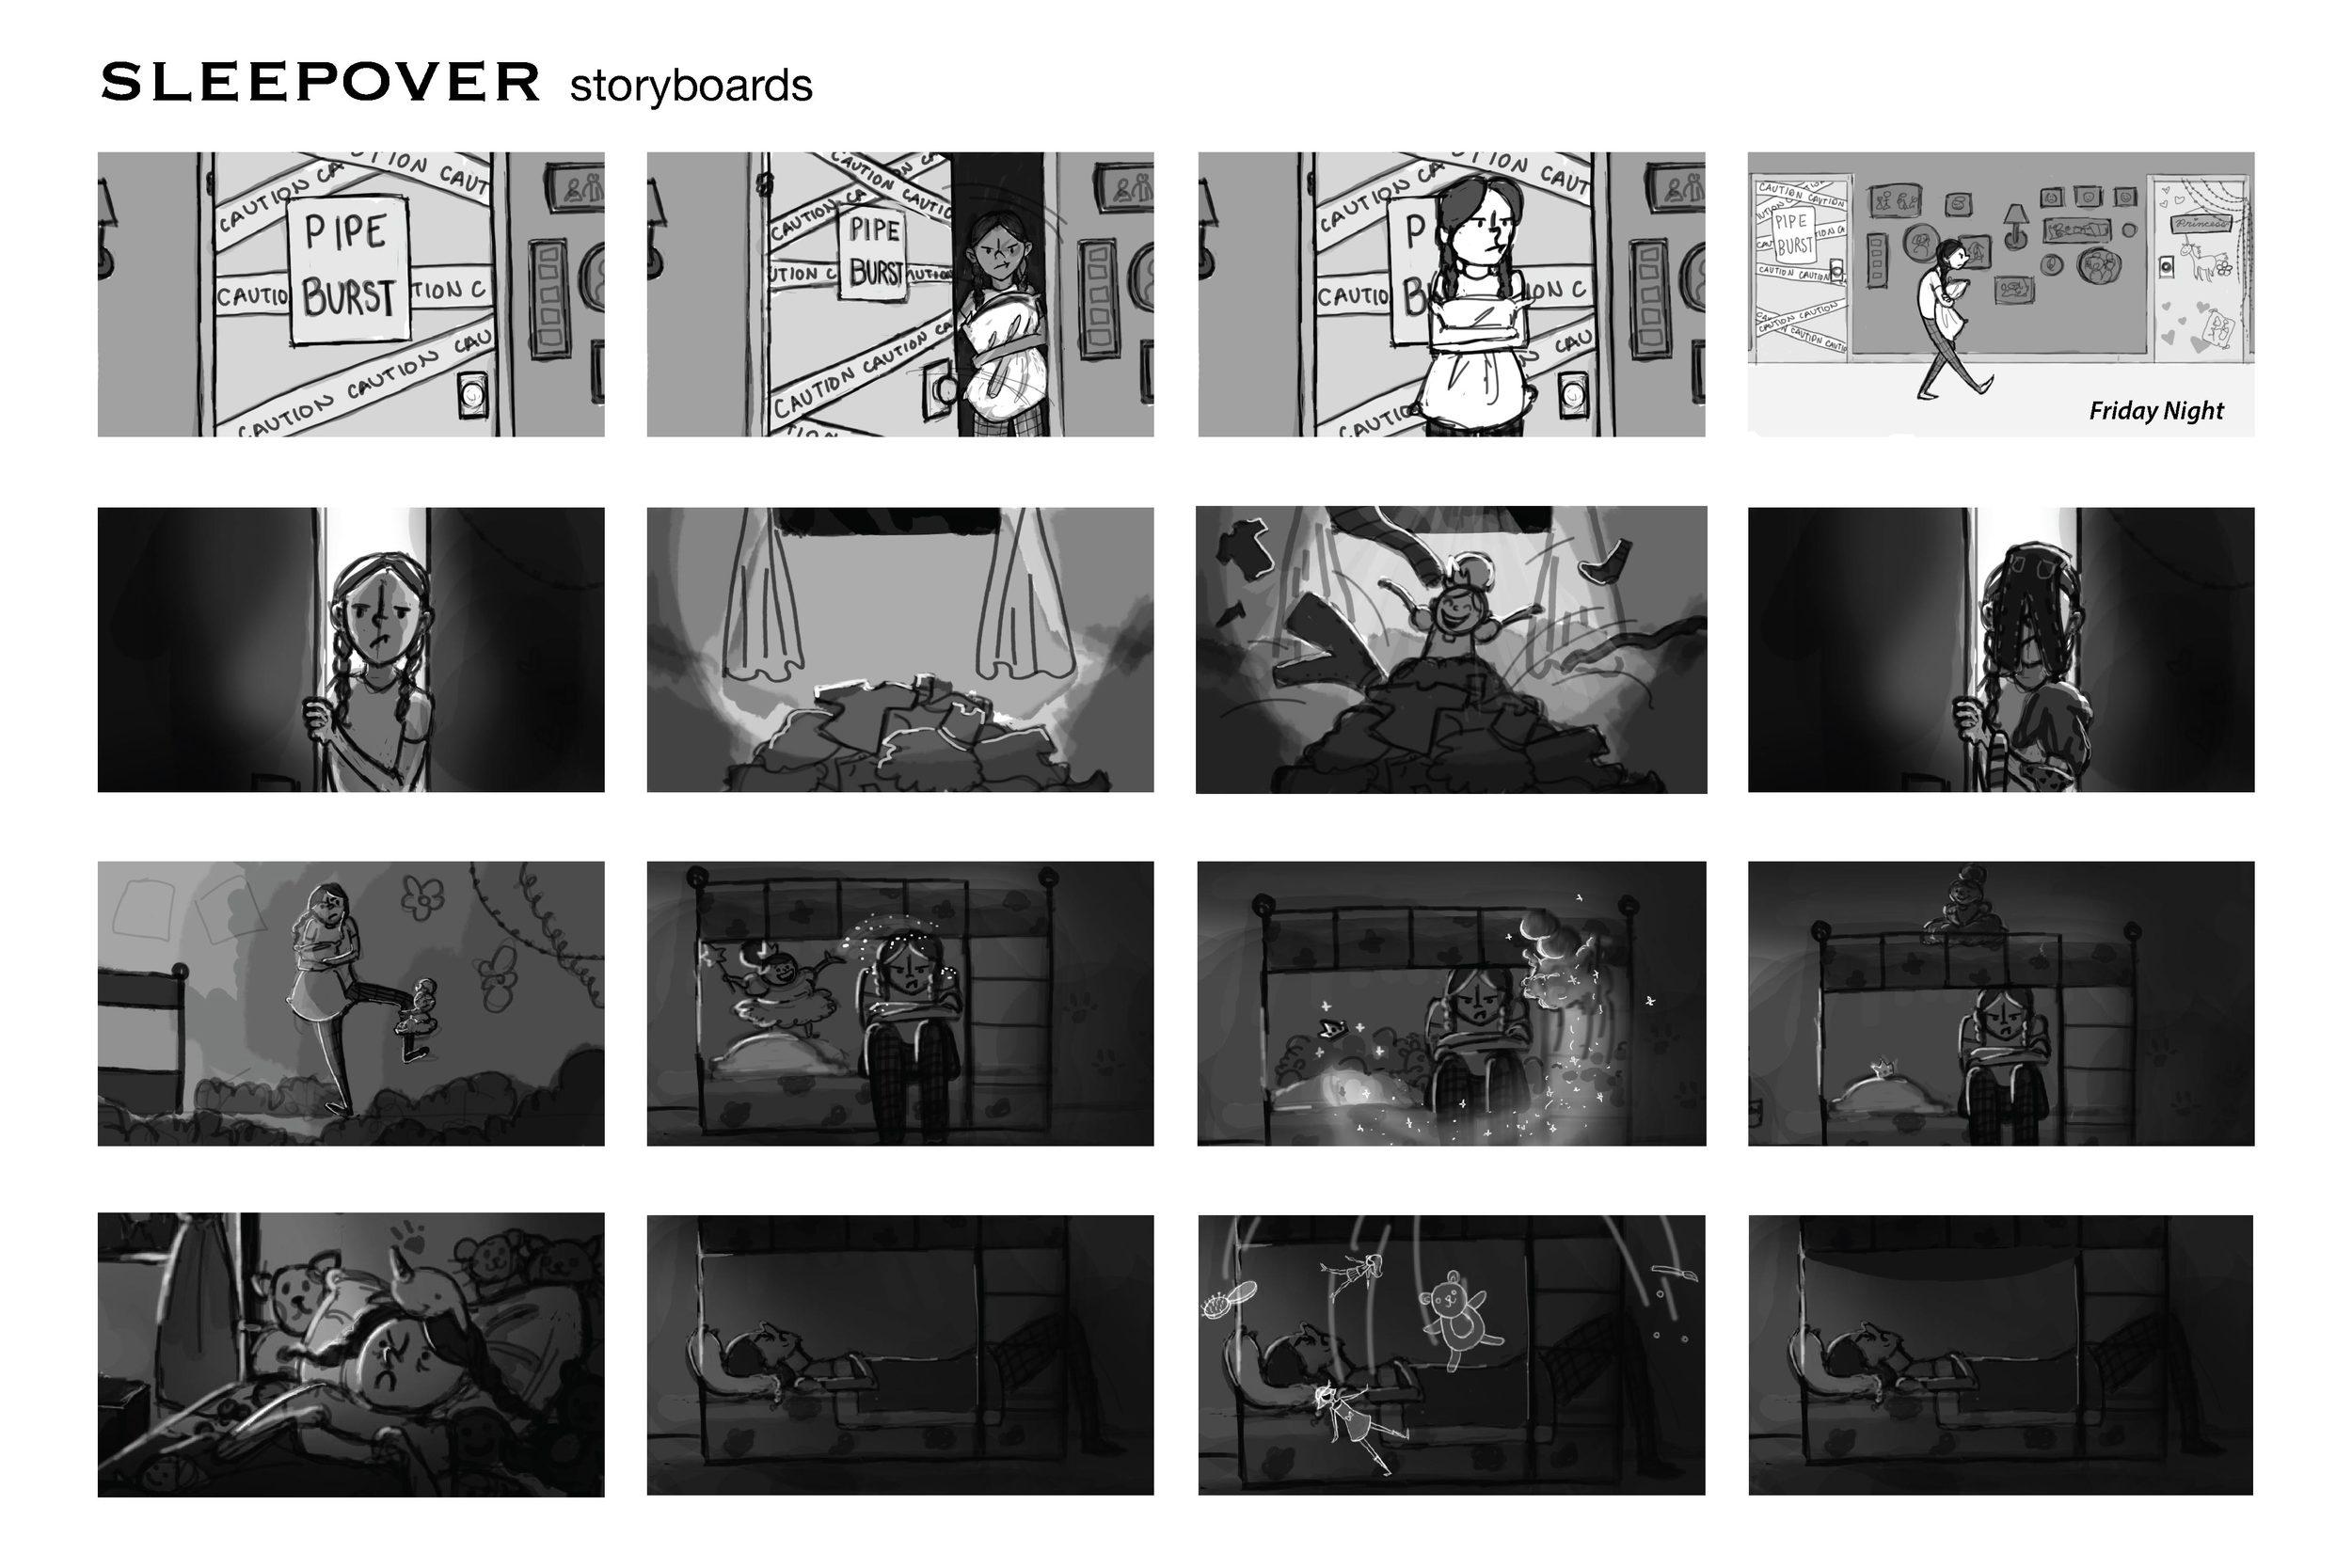 sleepover-page1-01.jpg